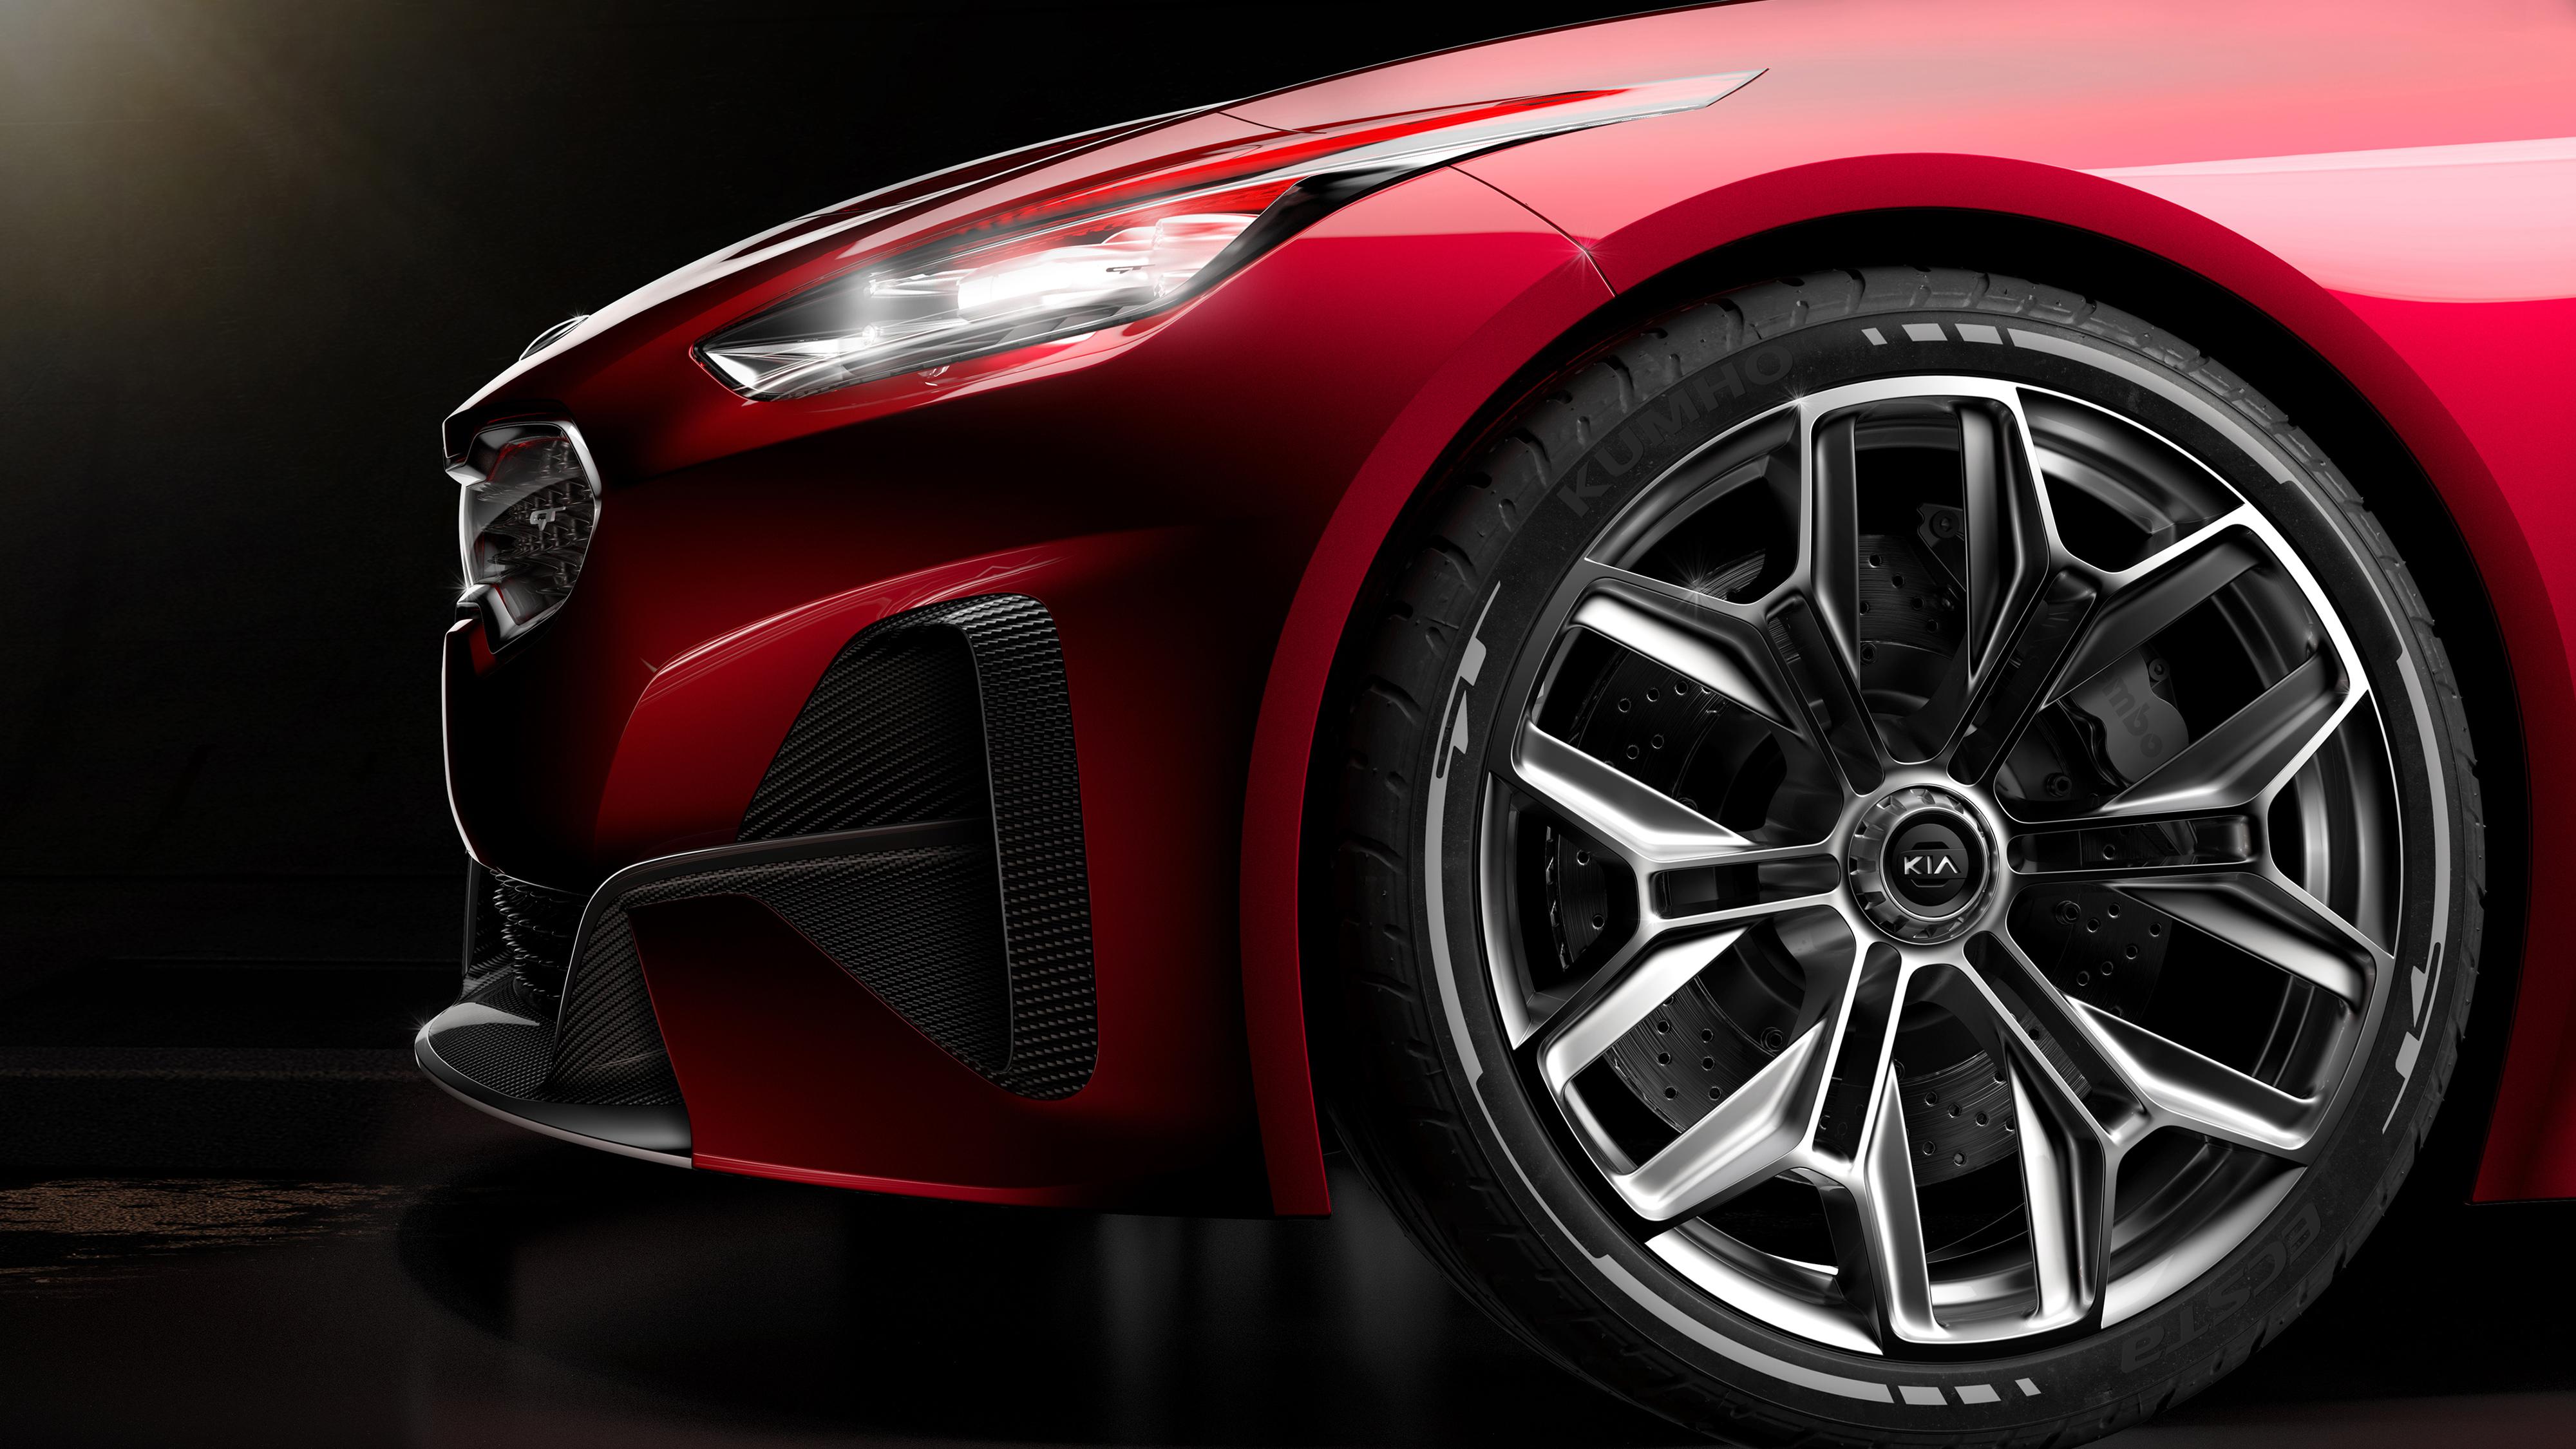 2012 Kia Forte Koup >> Kia Proceed Concept 2017 Frankfurt Motor Show 4K 4 ...